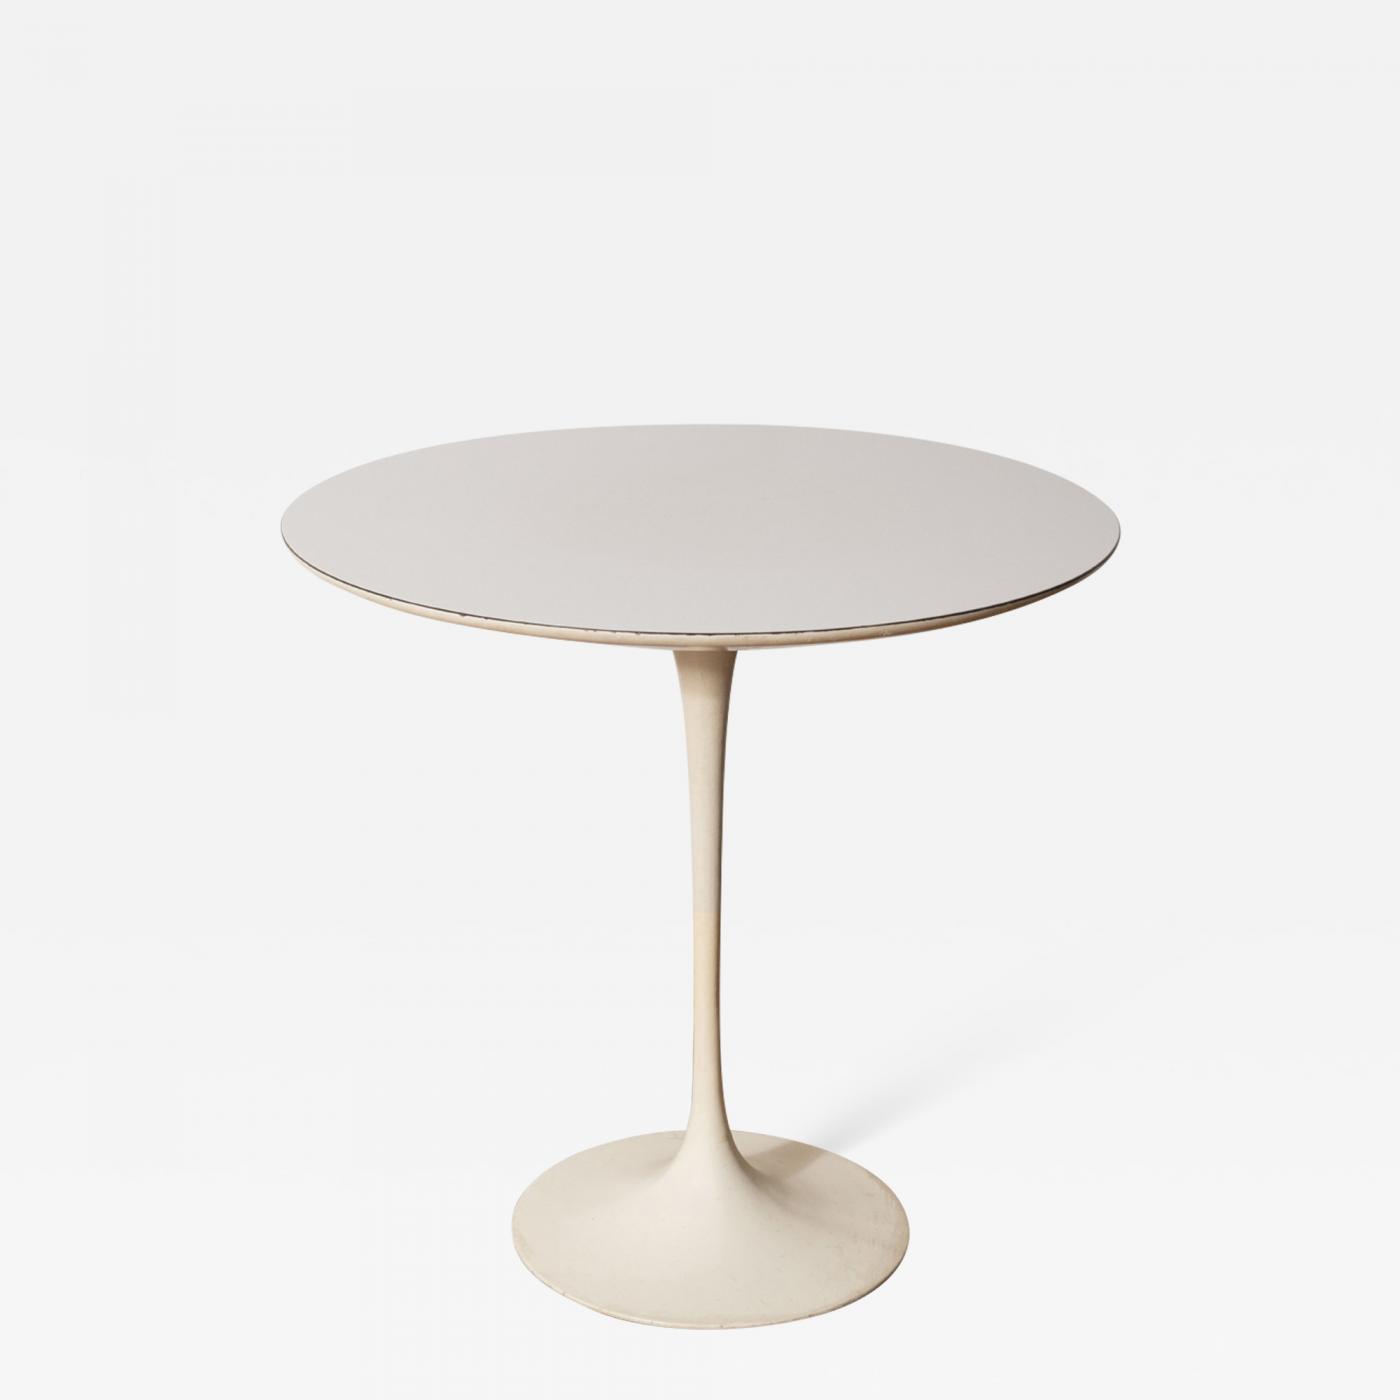 Early Eero Saarinen Round Tulip Side Table, Knoll, Model #160, USA, 1957